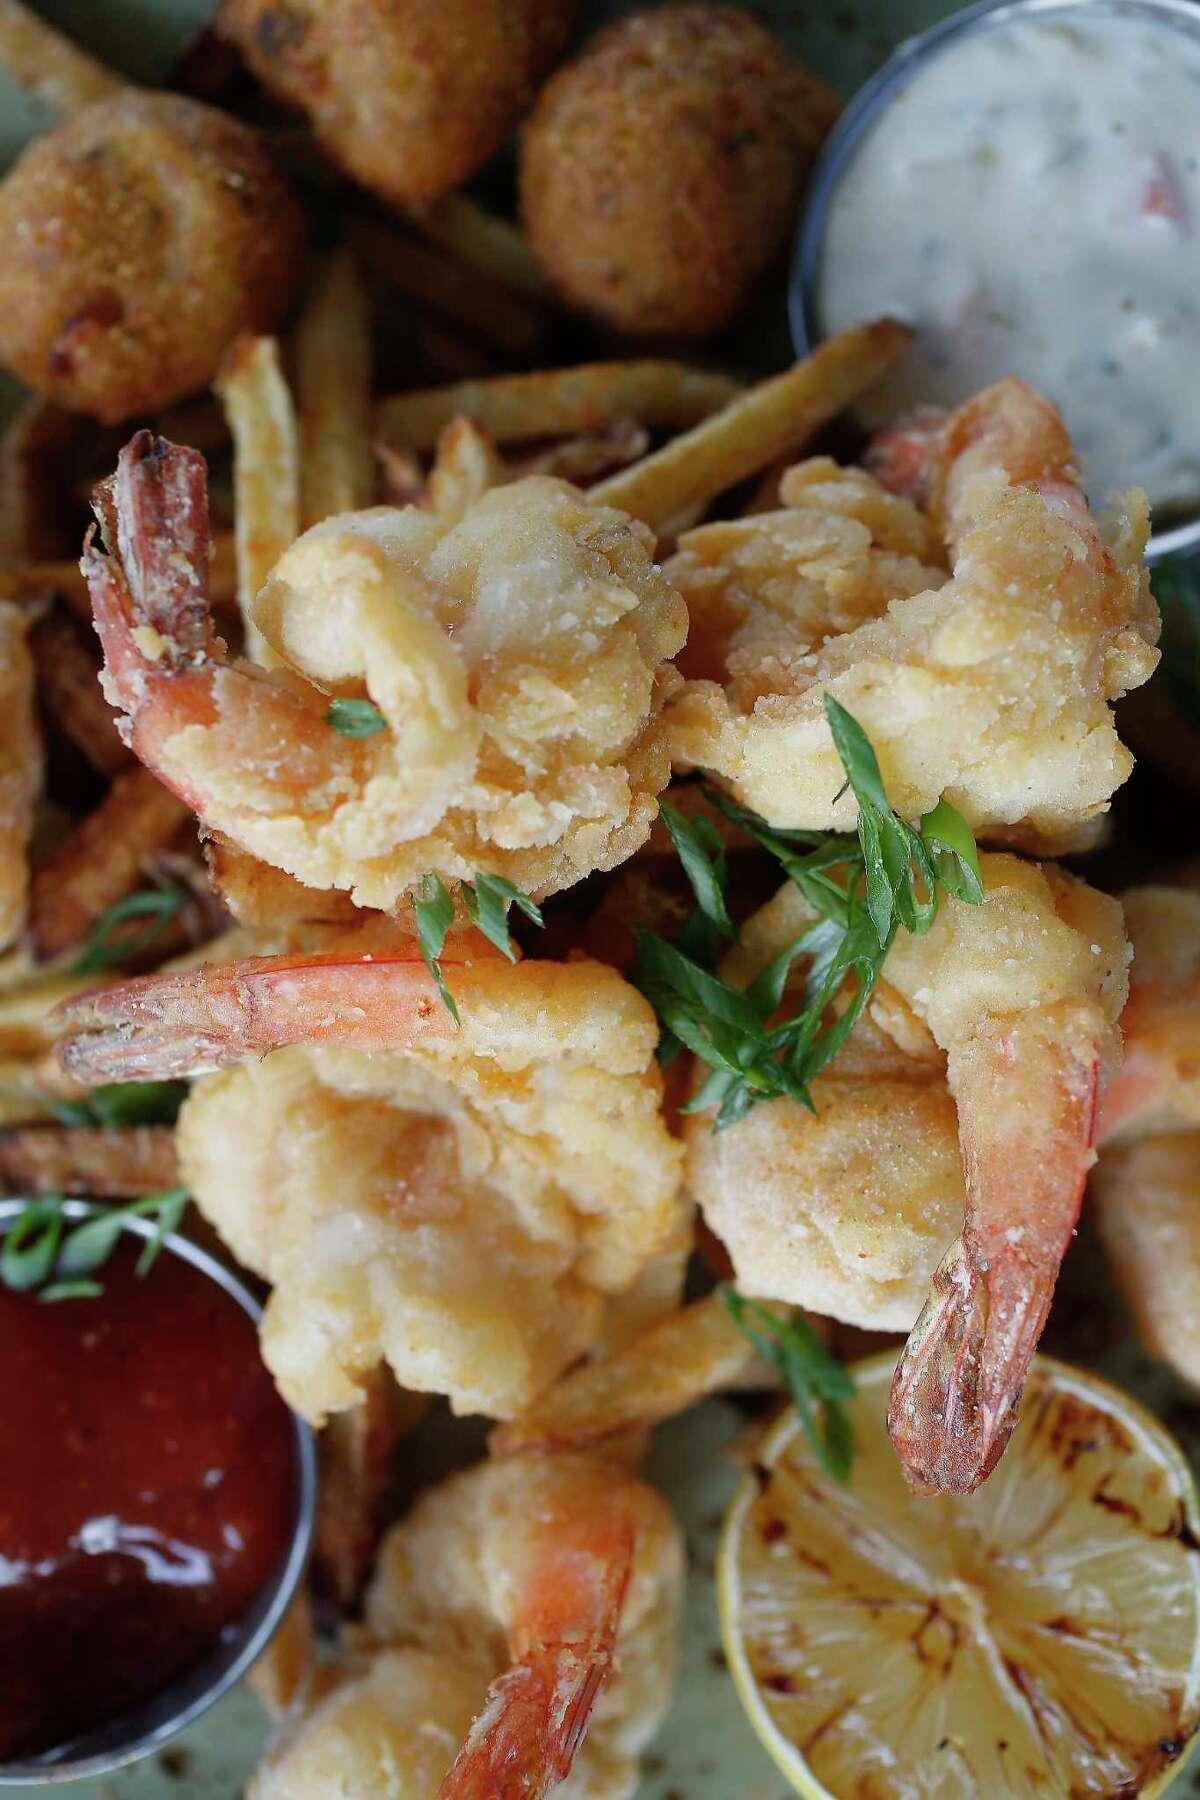 Classic Fried Shrimp at the new Union Kitchen restaurant opening Nov. 20 at 6011 Washington at the Westcott circle.